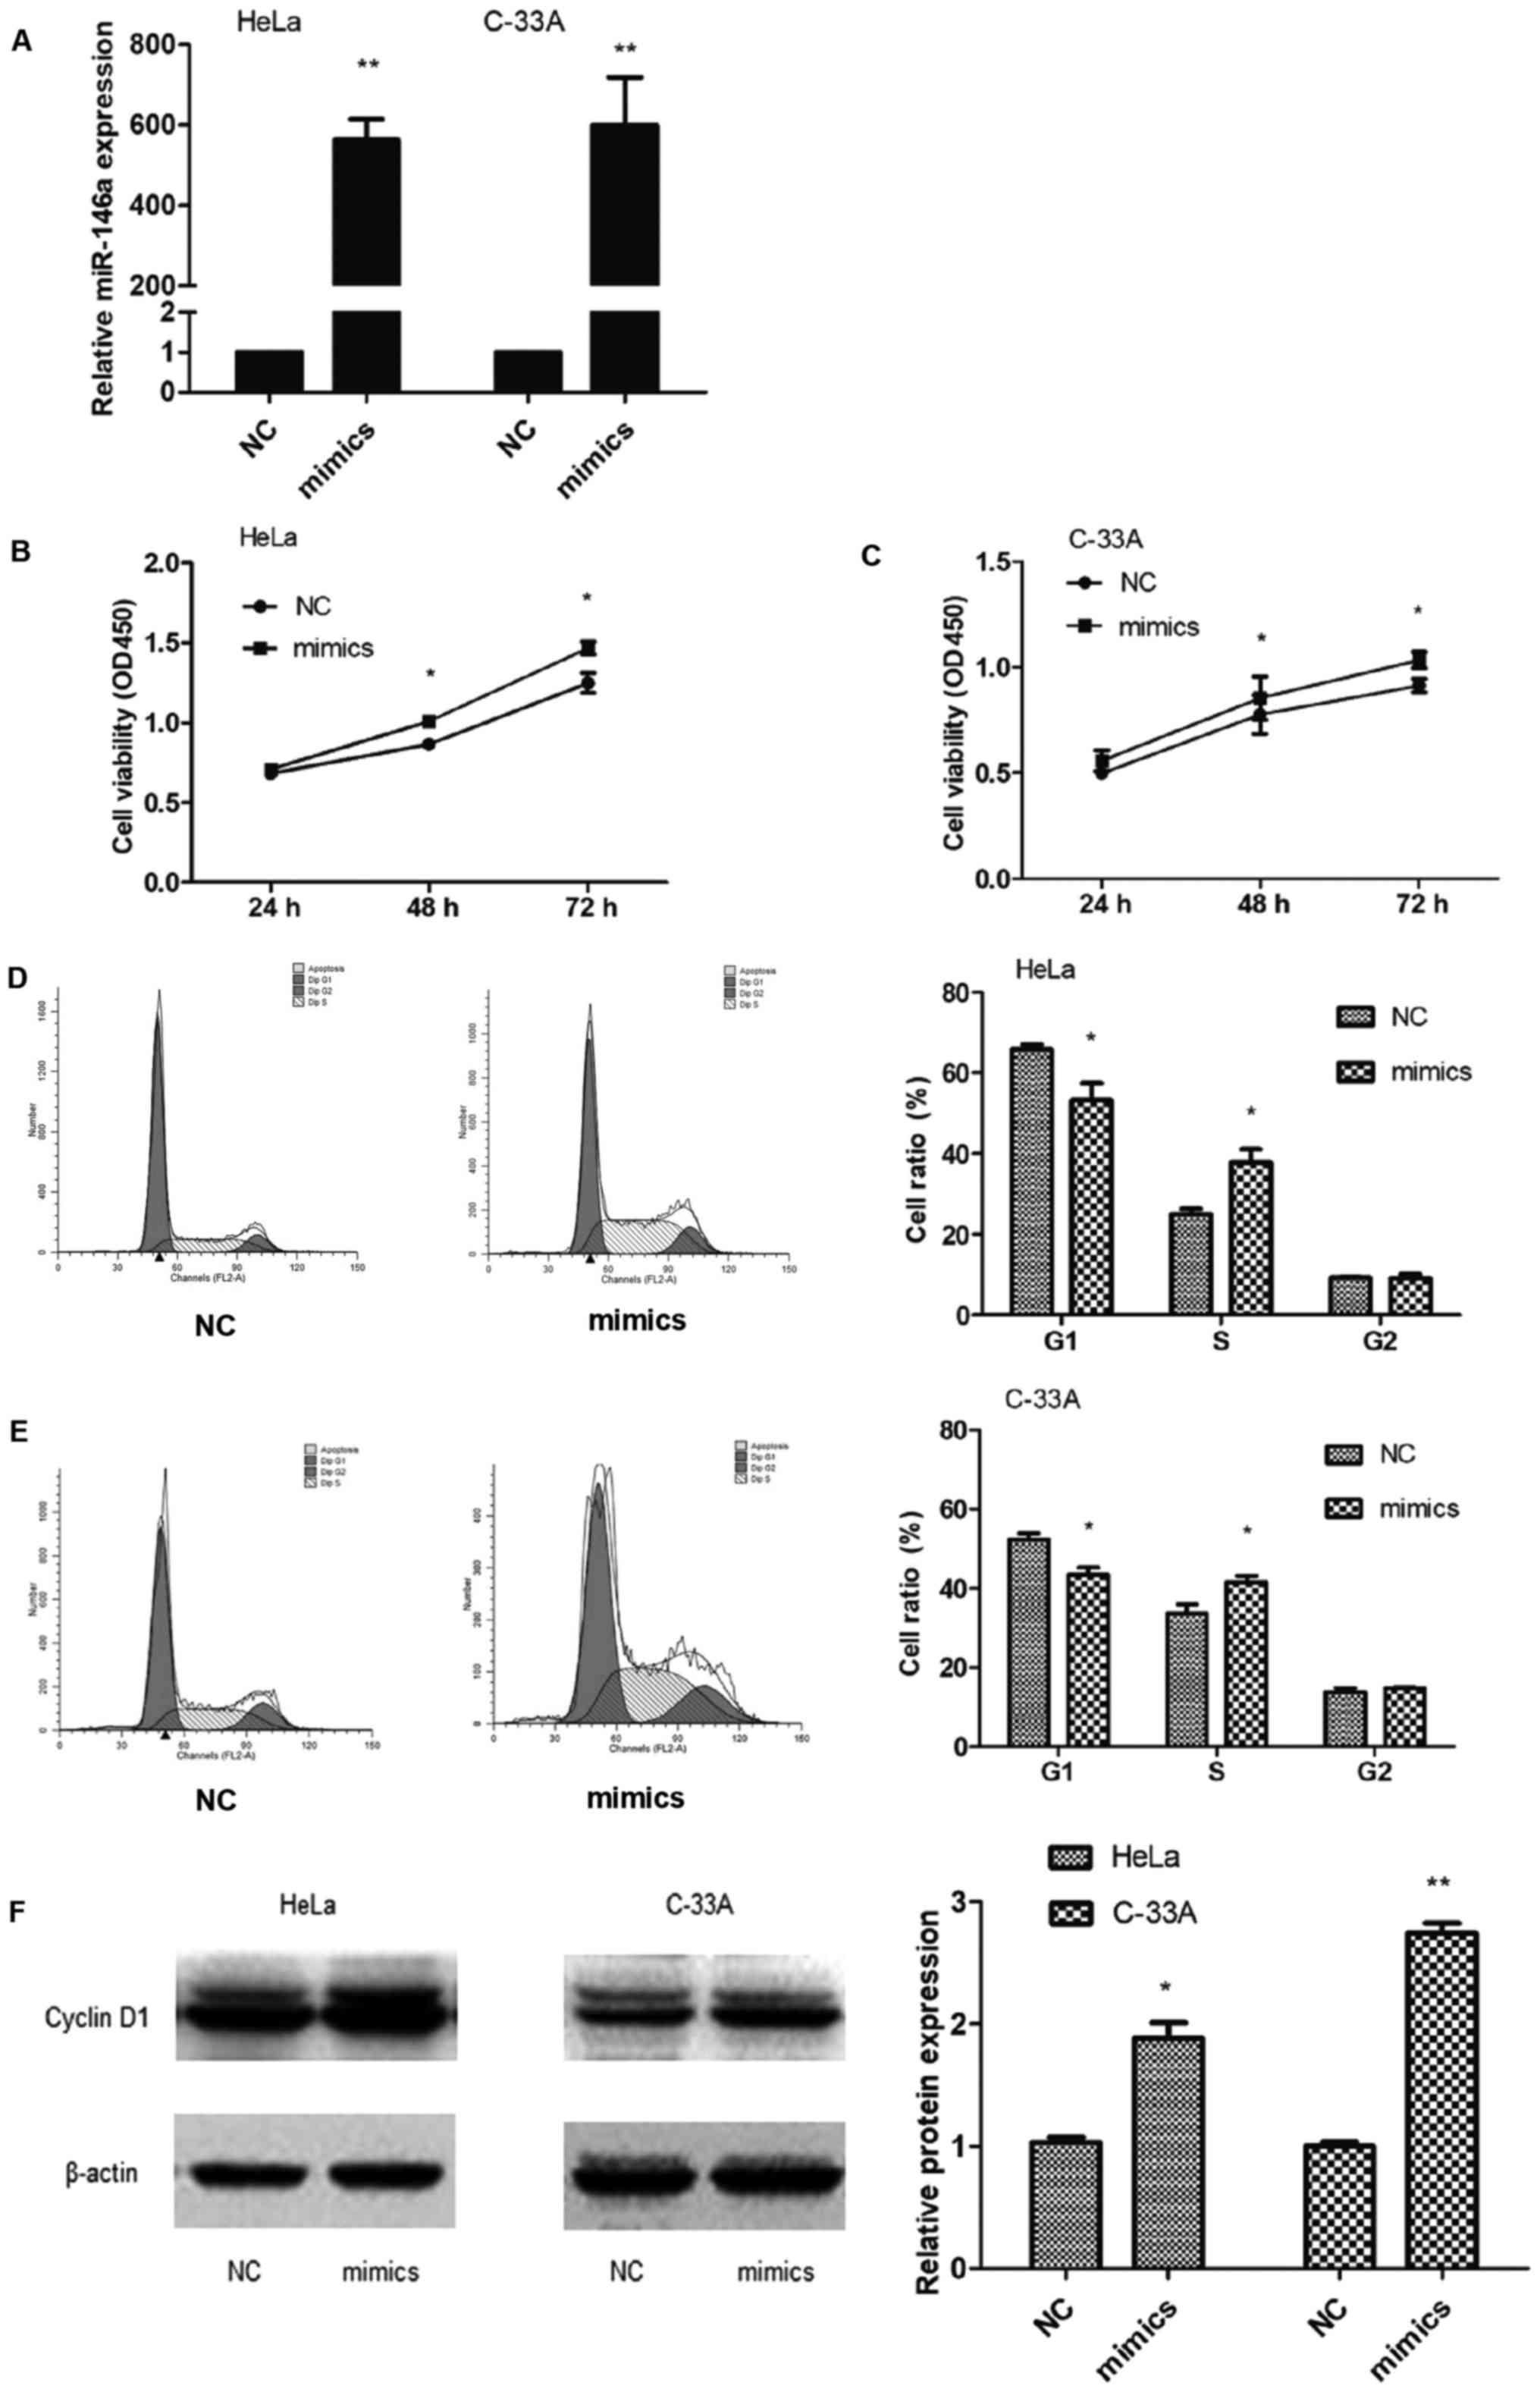 miR-146a promotes cervical cancer cell viability via